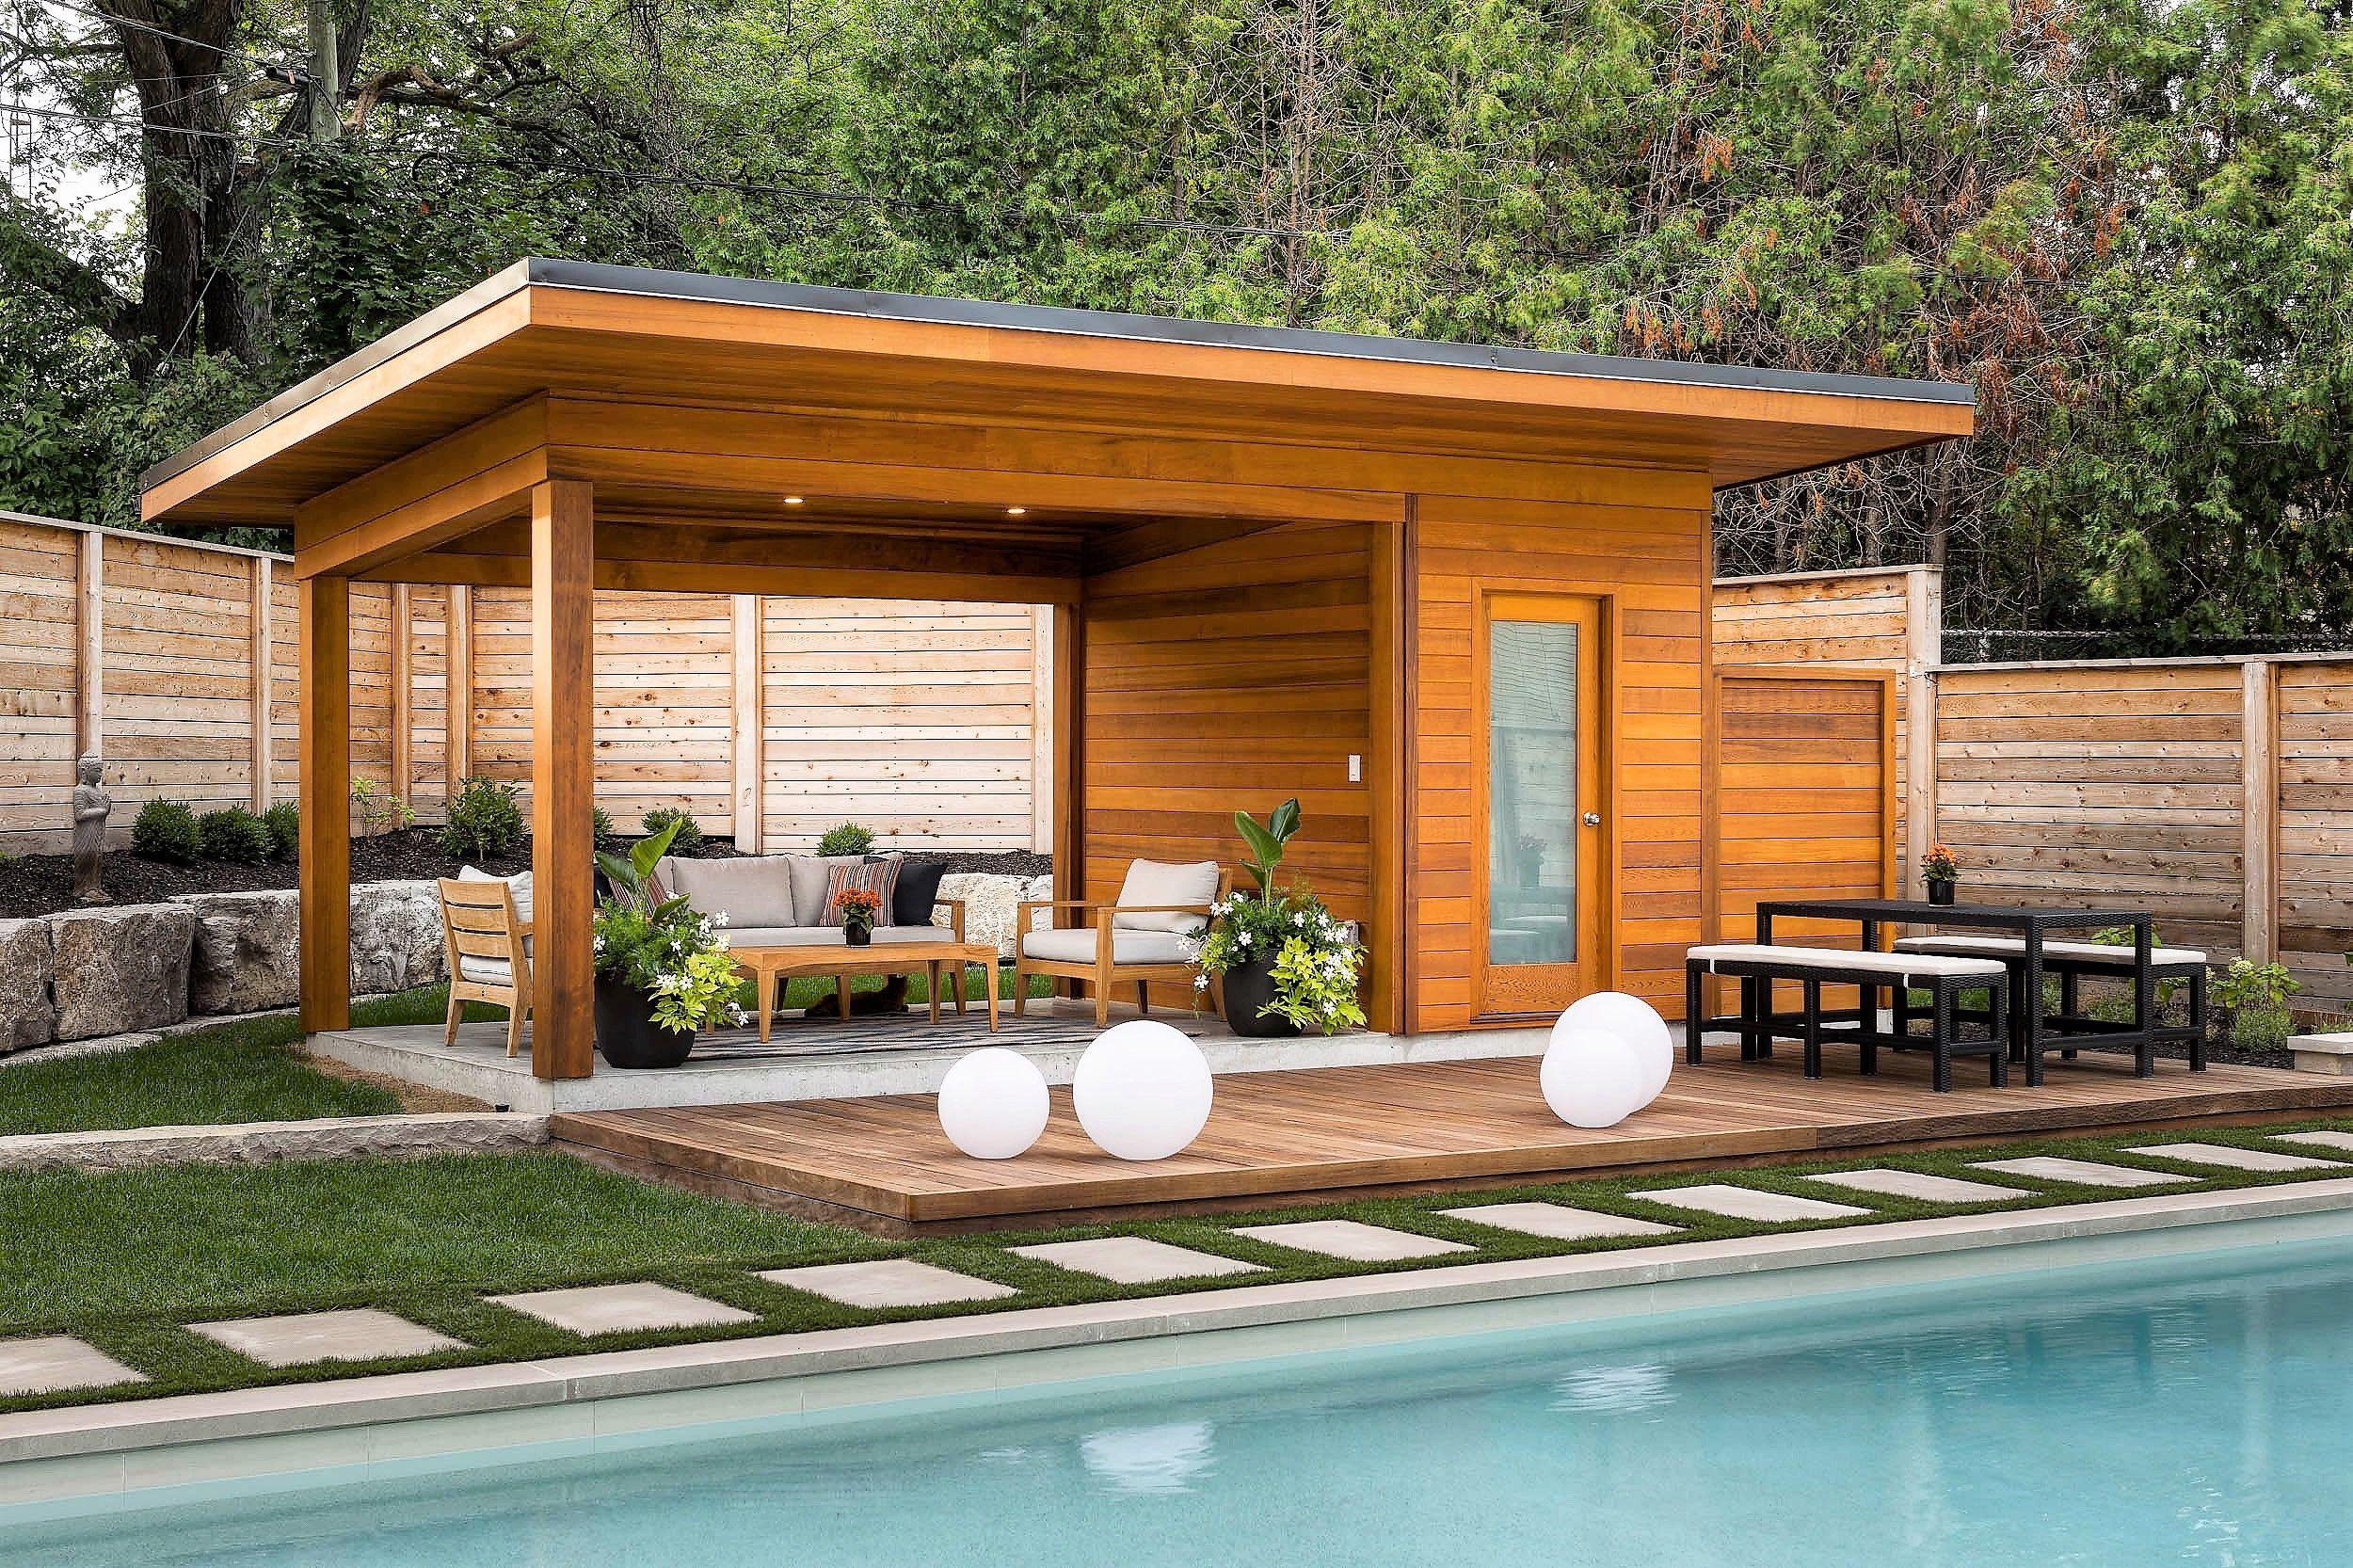 Custom 10 X 20 Sanara Pool Cabana With Overhang In Toronto